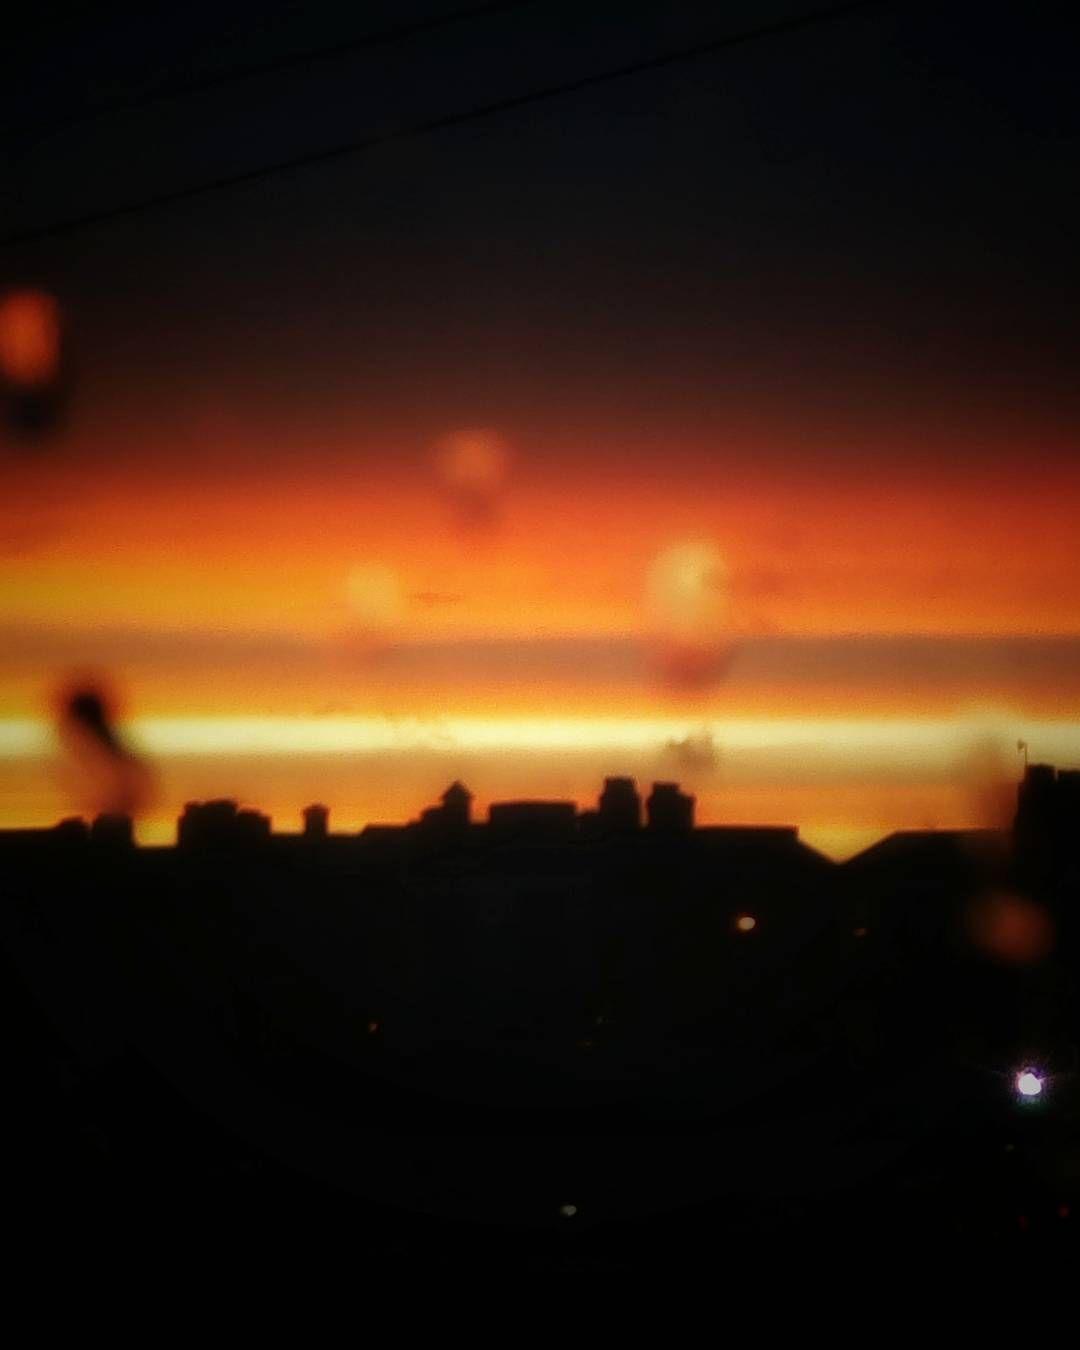 Envelope #sunset #dublin #connellystation #winter #evening #coucherdesoleil #fire #fiery #sky #skyline #clouds #rain #drops #train #weekend